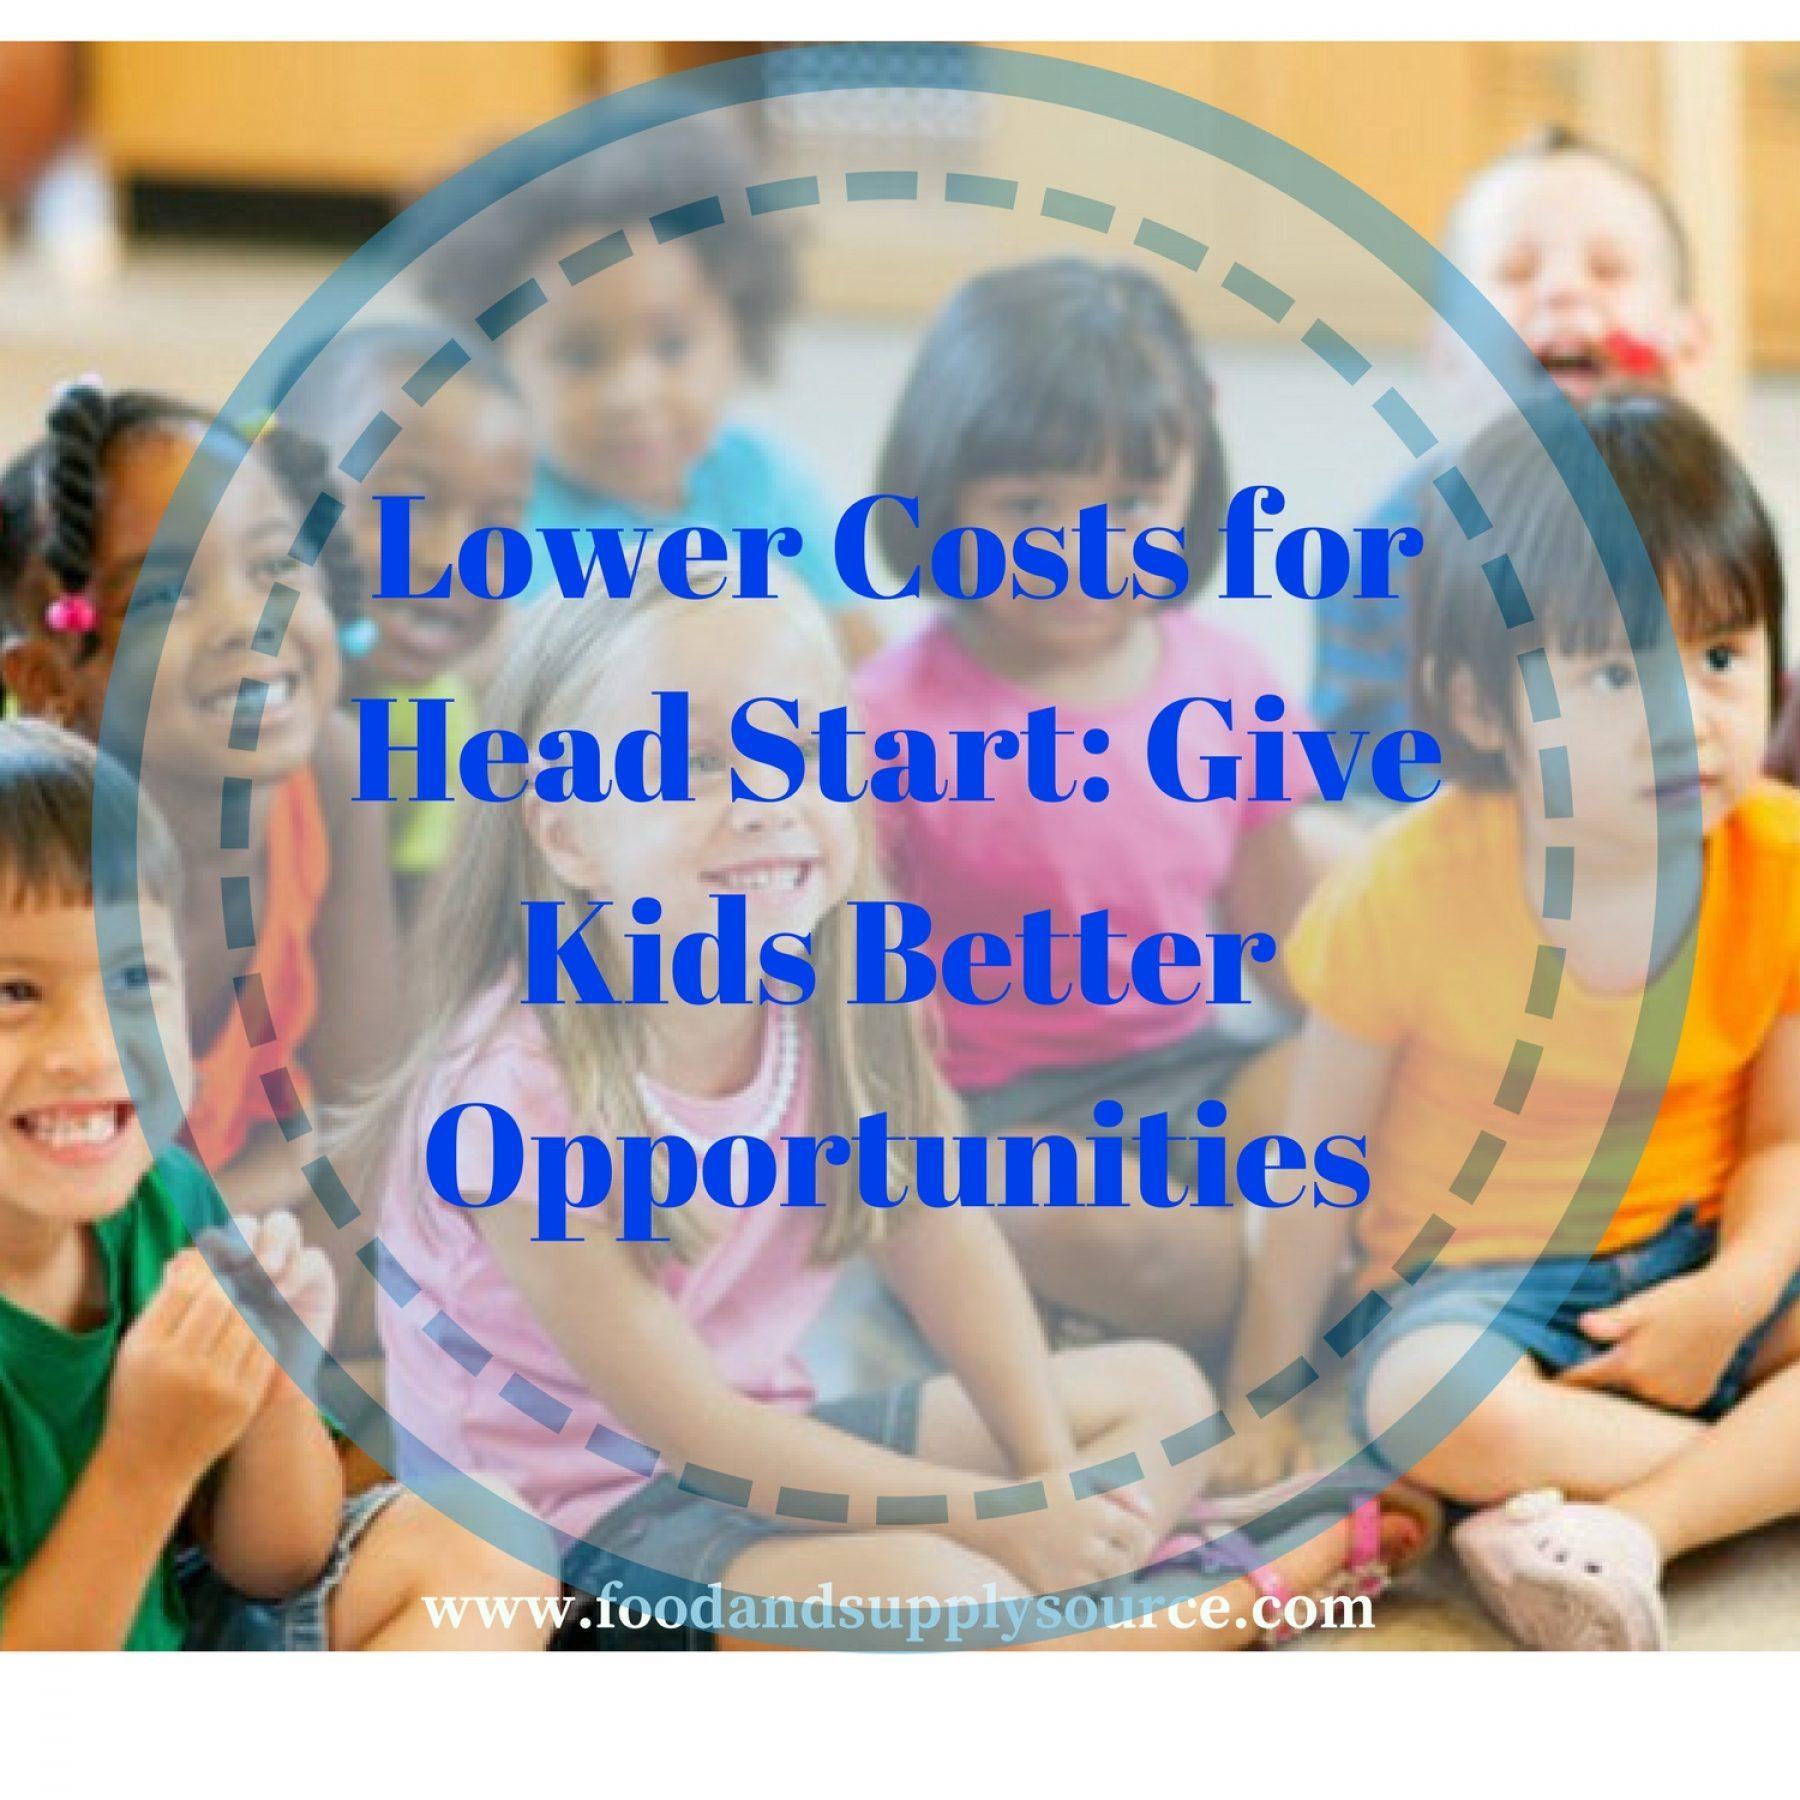 How Rich Kids Get Head Start >> Lower Costs For Head Start Give Kids Better Opportunities Food